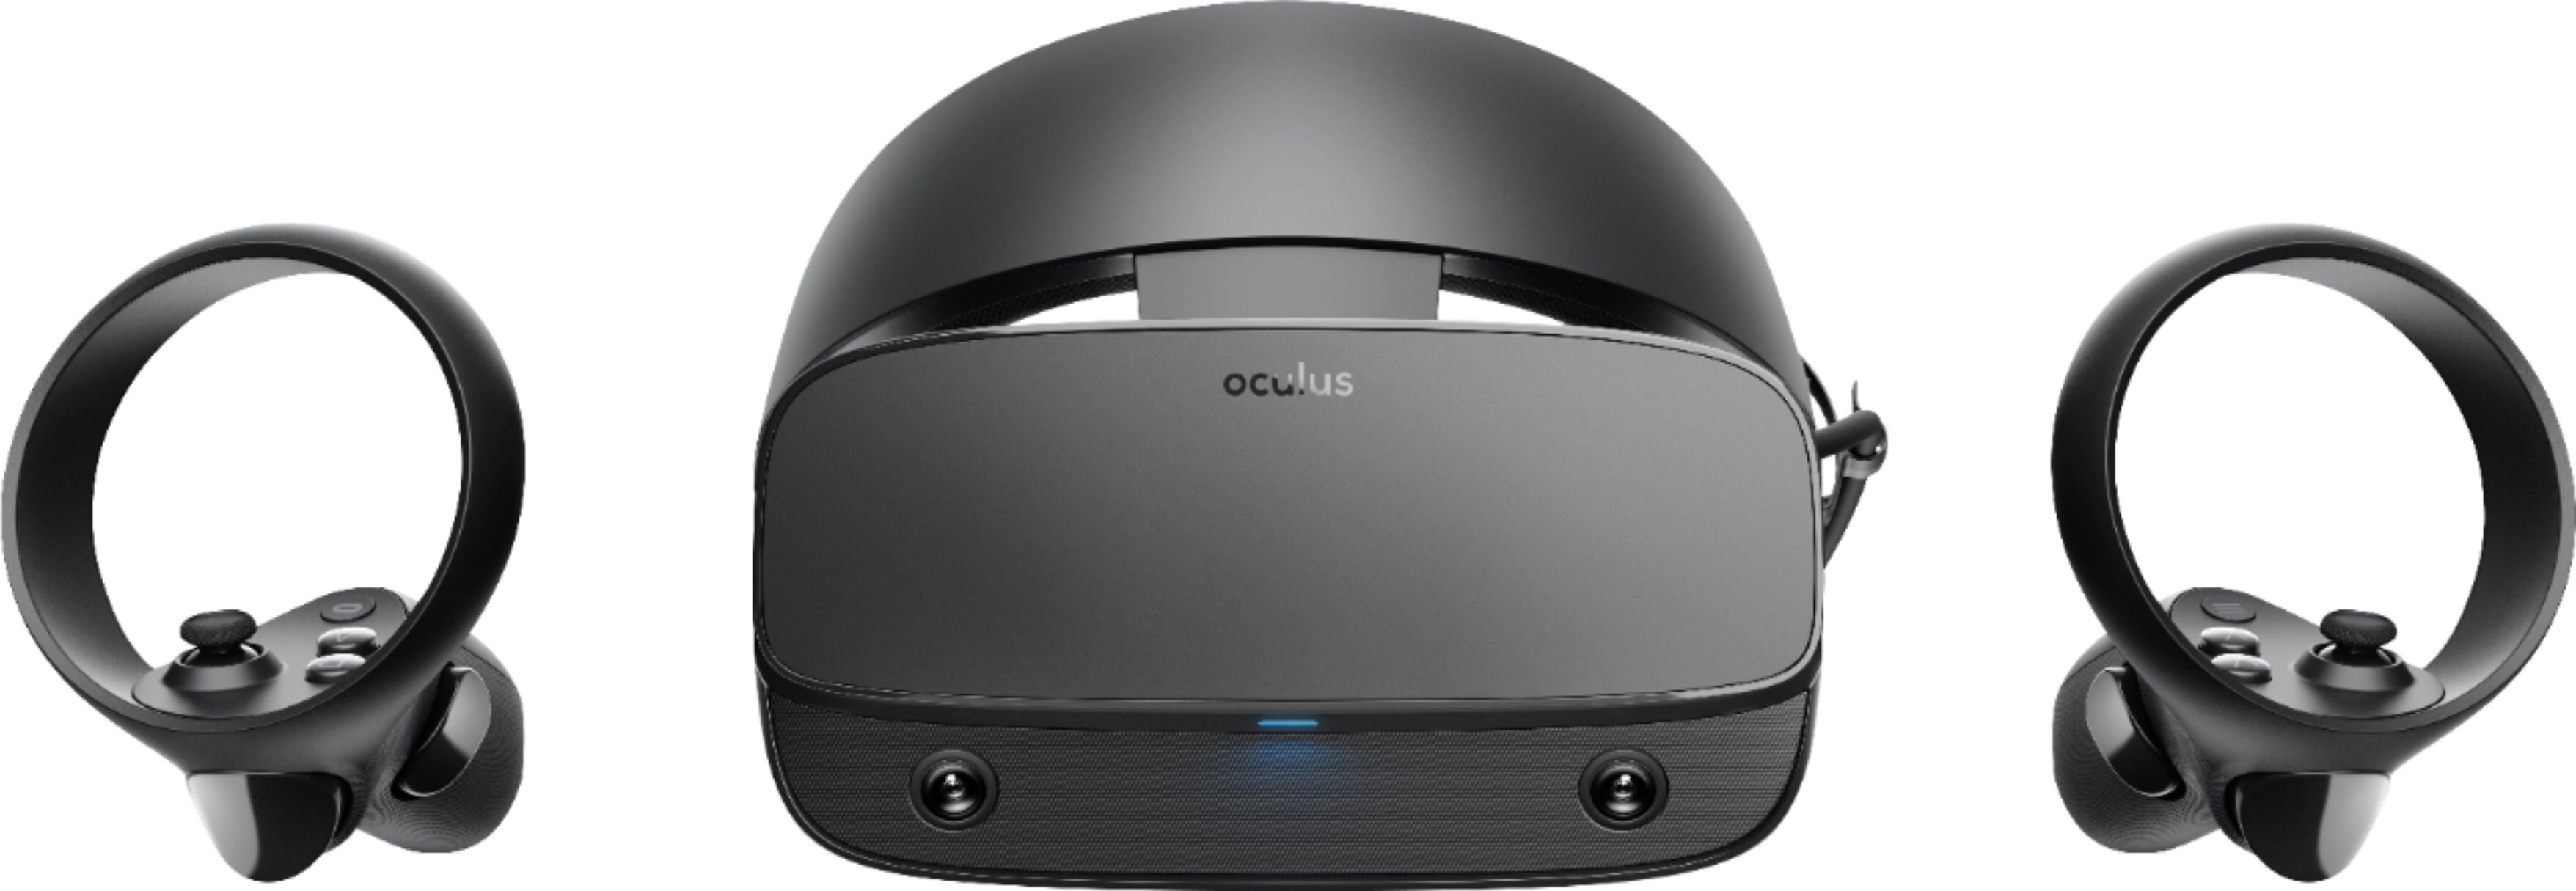 oculus 5ch ファームウェア